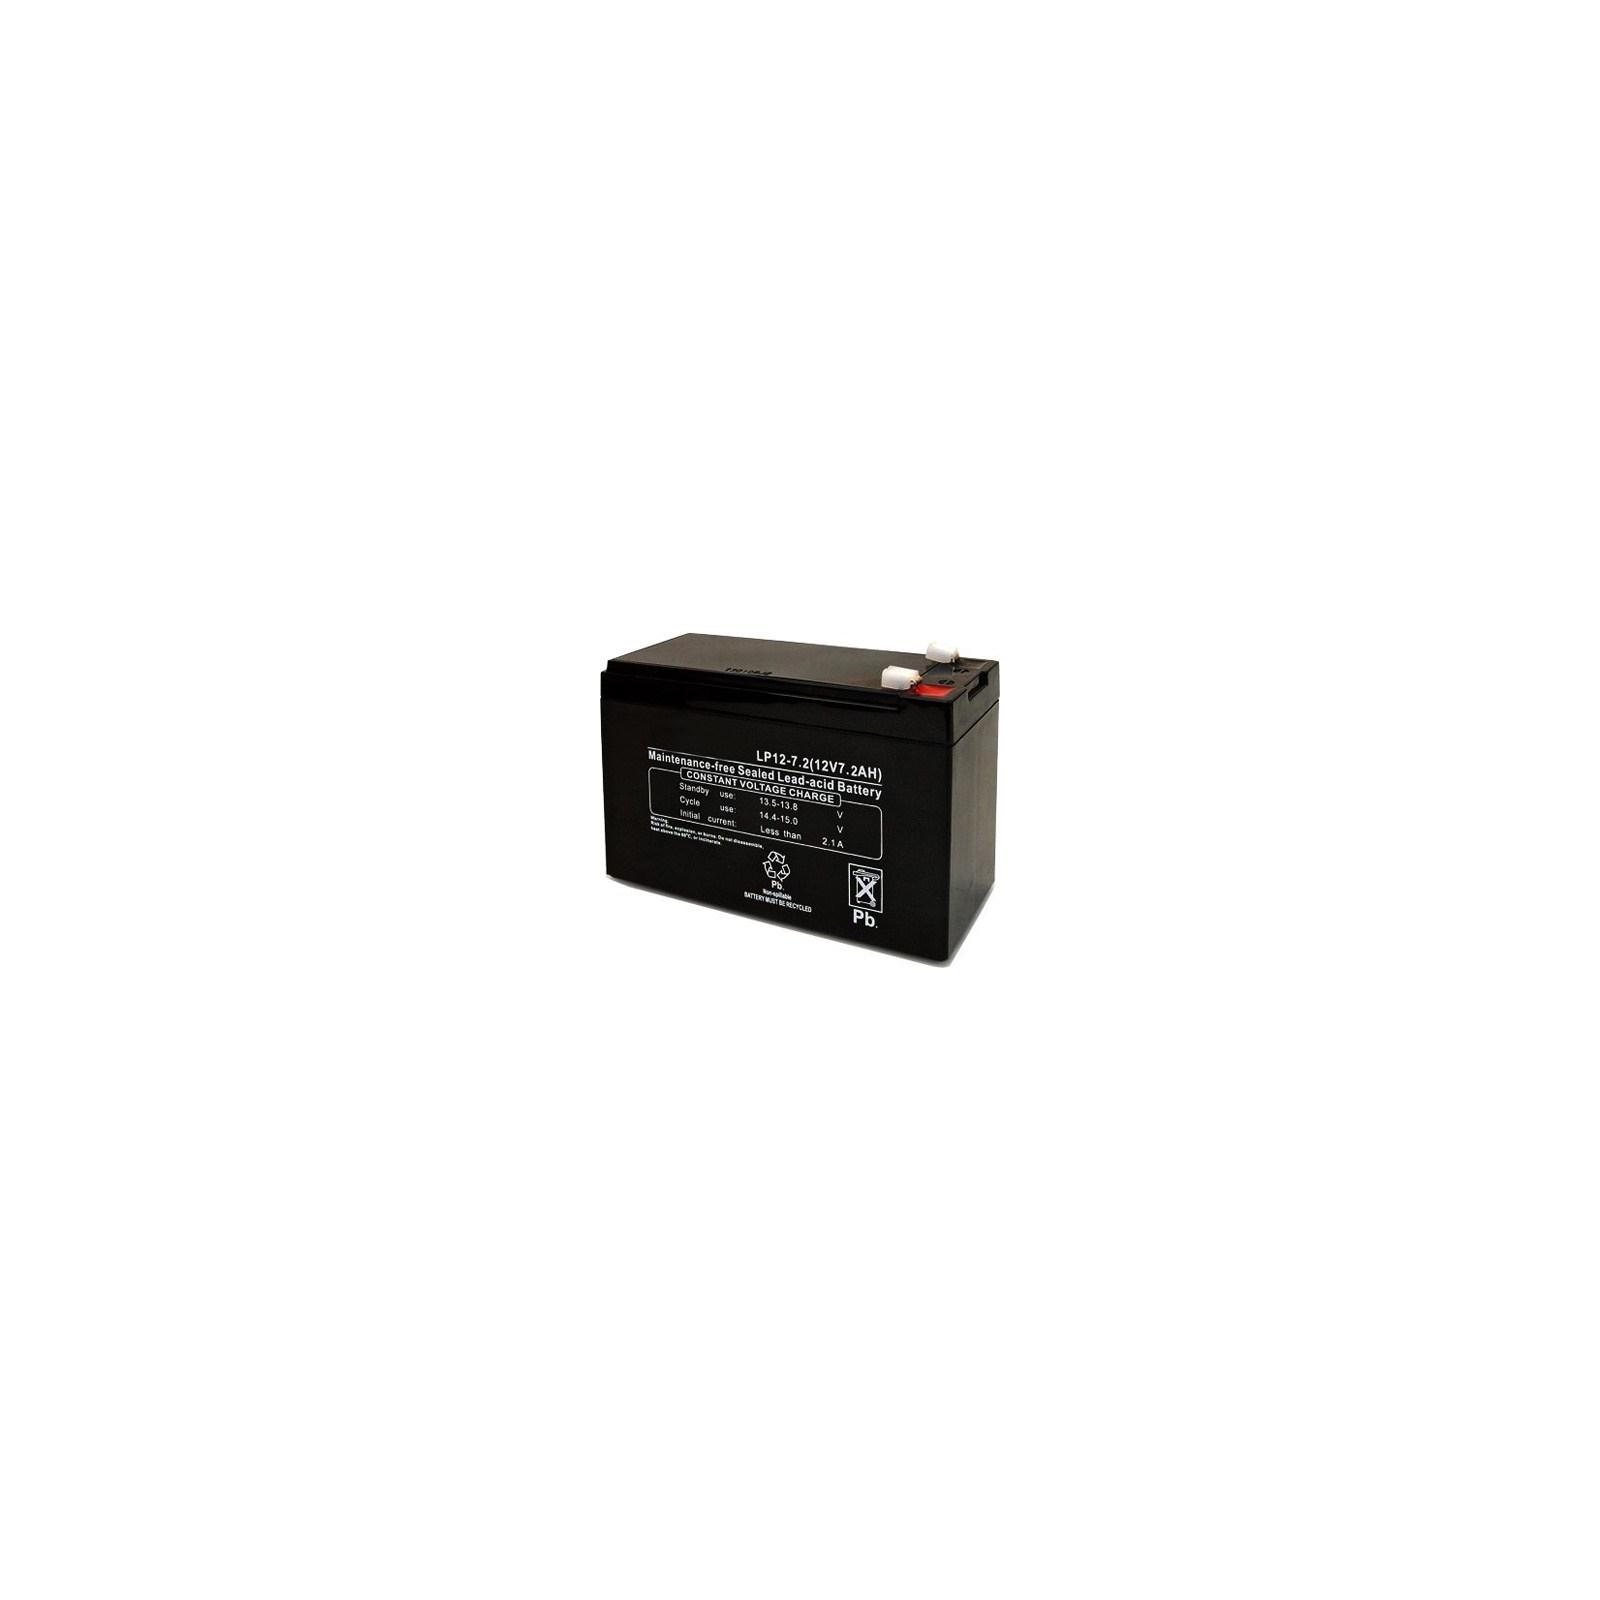 Батарея к ИБП 12В 7.2 Ач LogicPower (1514)